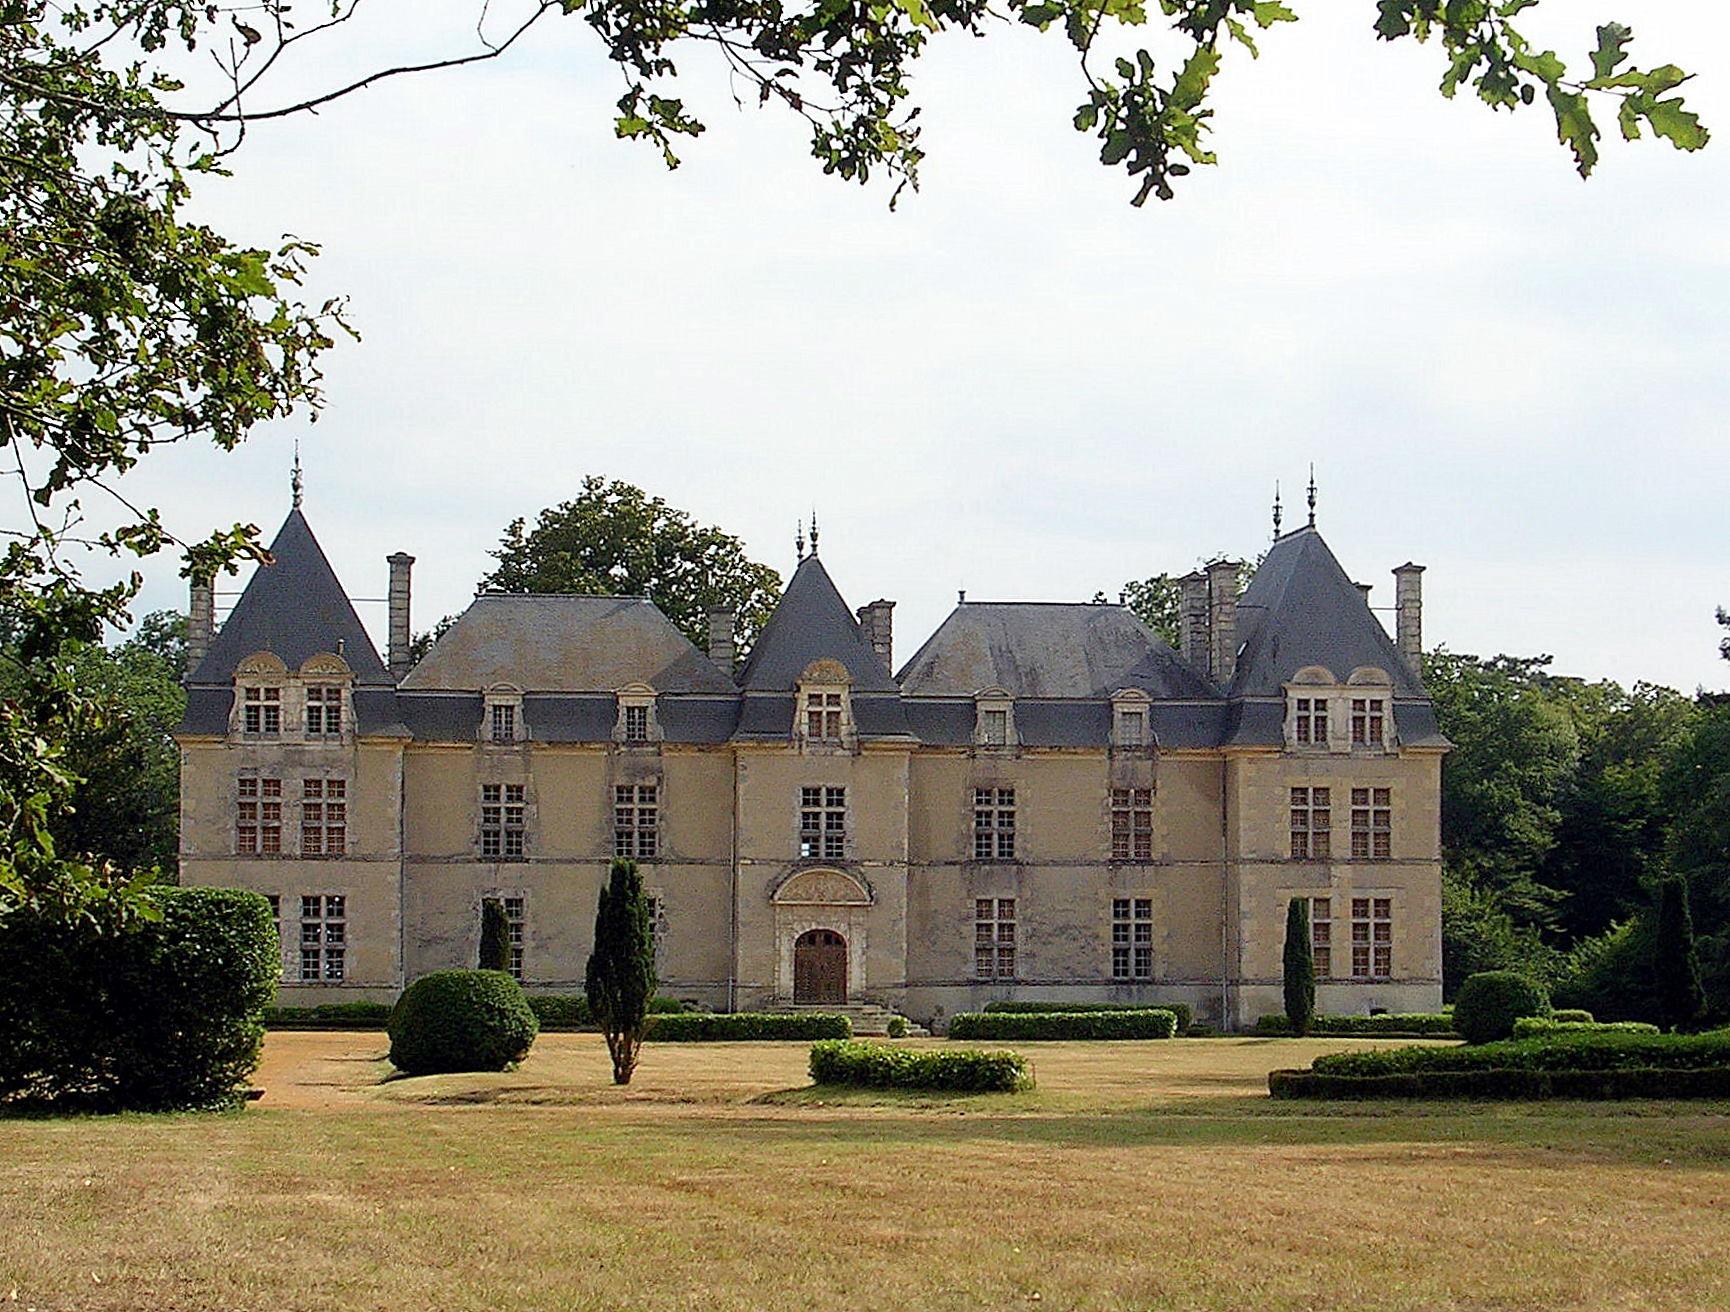 2871-chateau-de-ravignan-landes-perquie.jpg